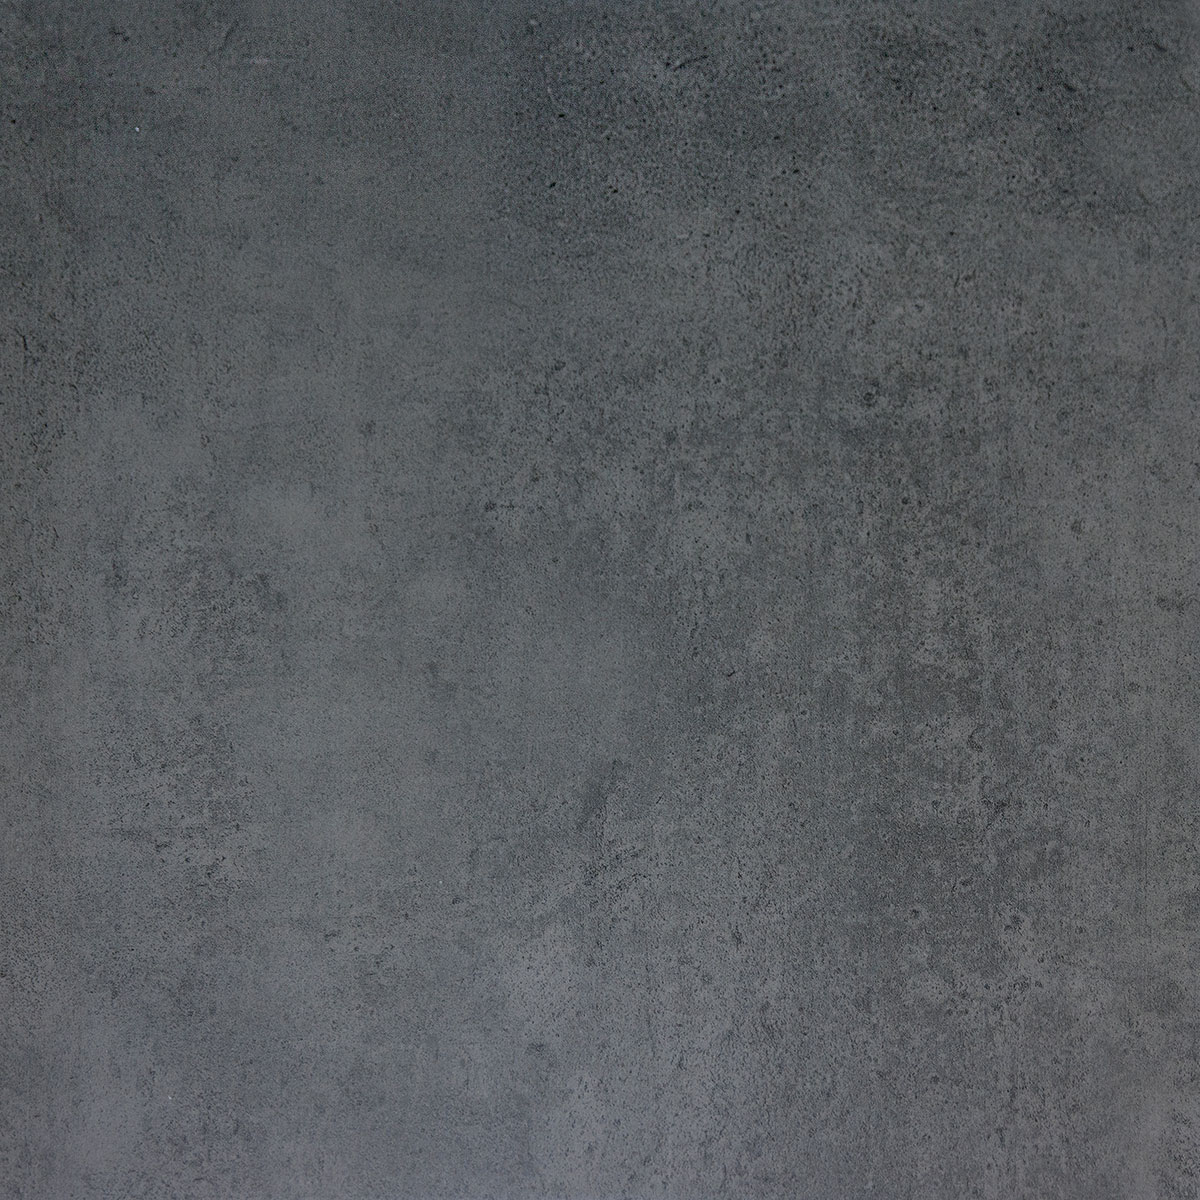 ROCKSTONE anthracite matt Image